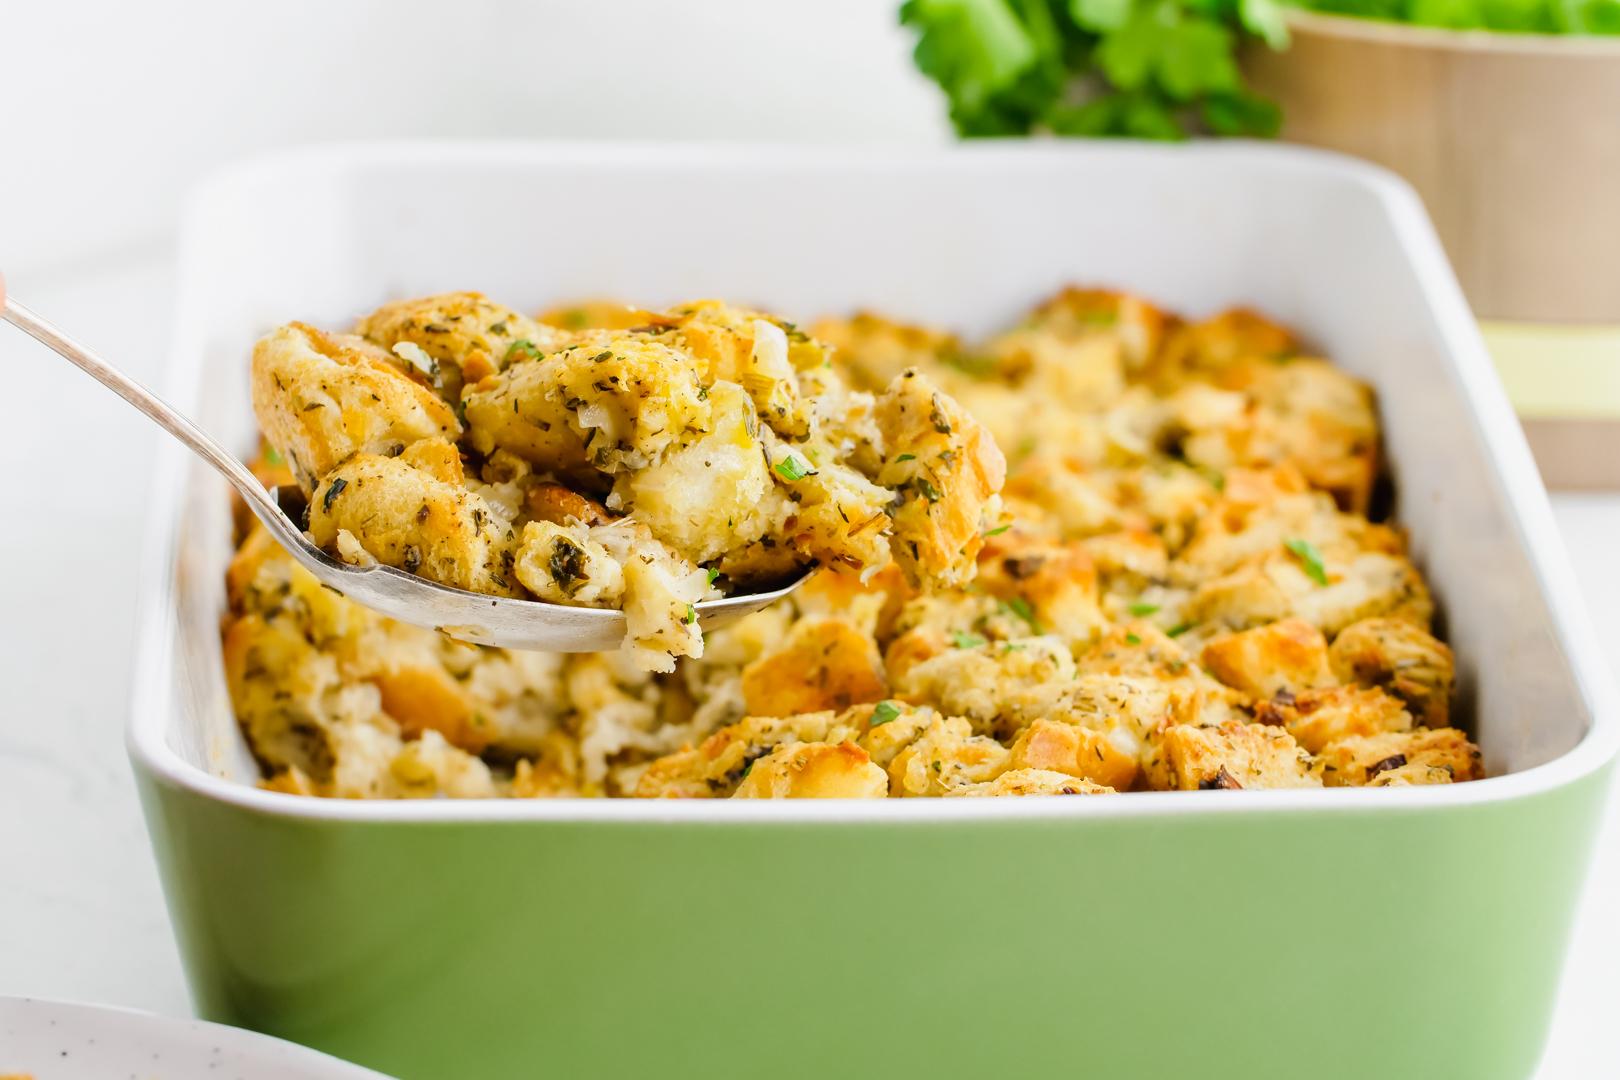 stuffing in a casserole dish